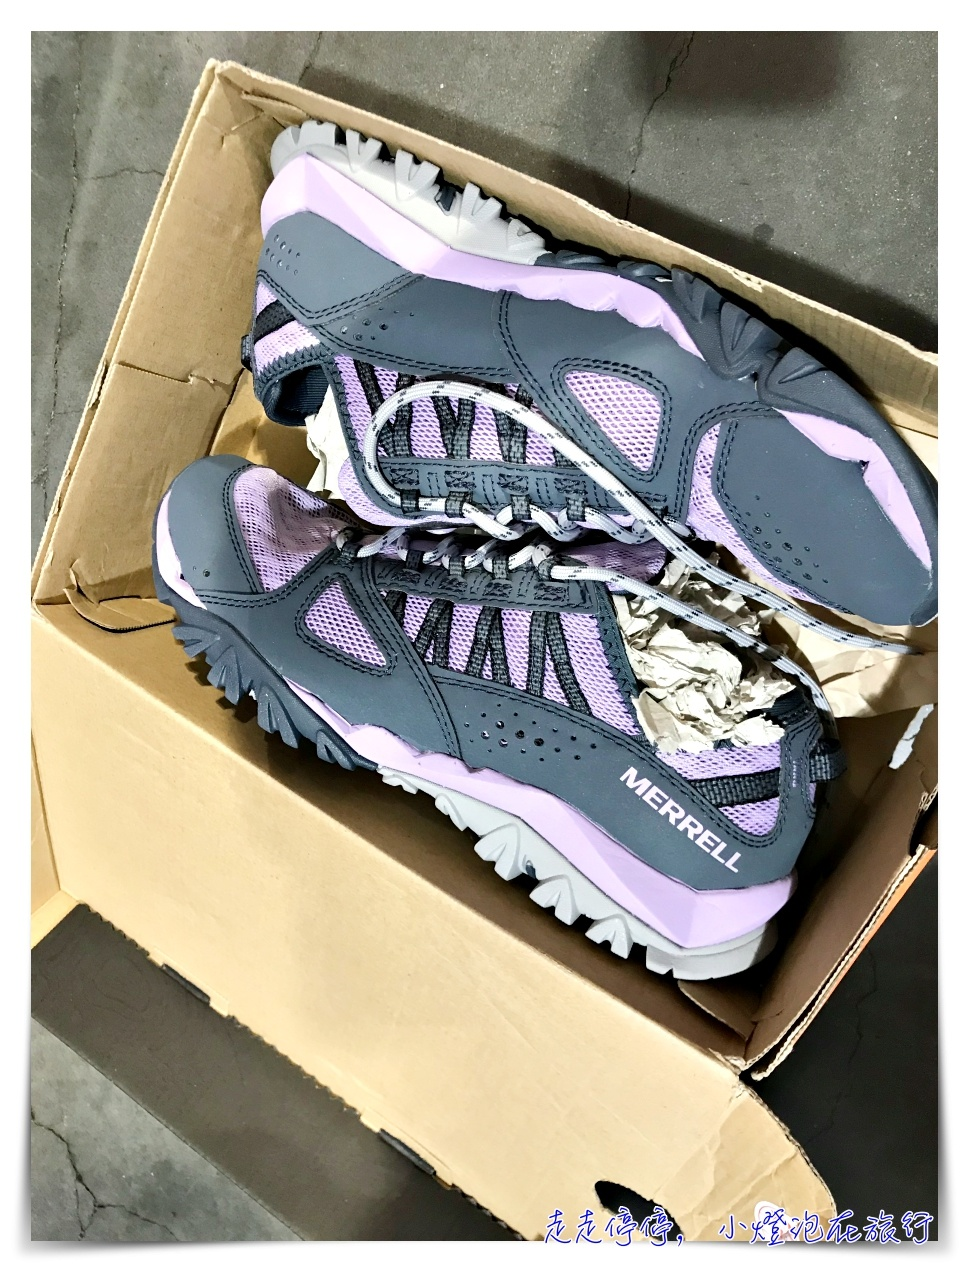 MERRELL水陸兩用鞋|多功能好穿旅行鞋推薦。 WATERPRO Malpo 水陸兩棲,costco特價採買紀錄~